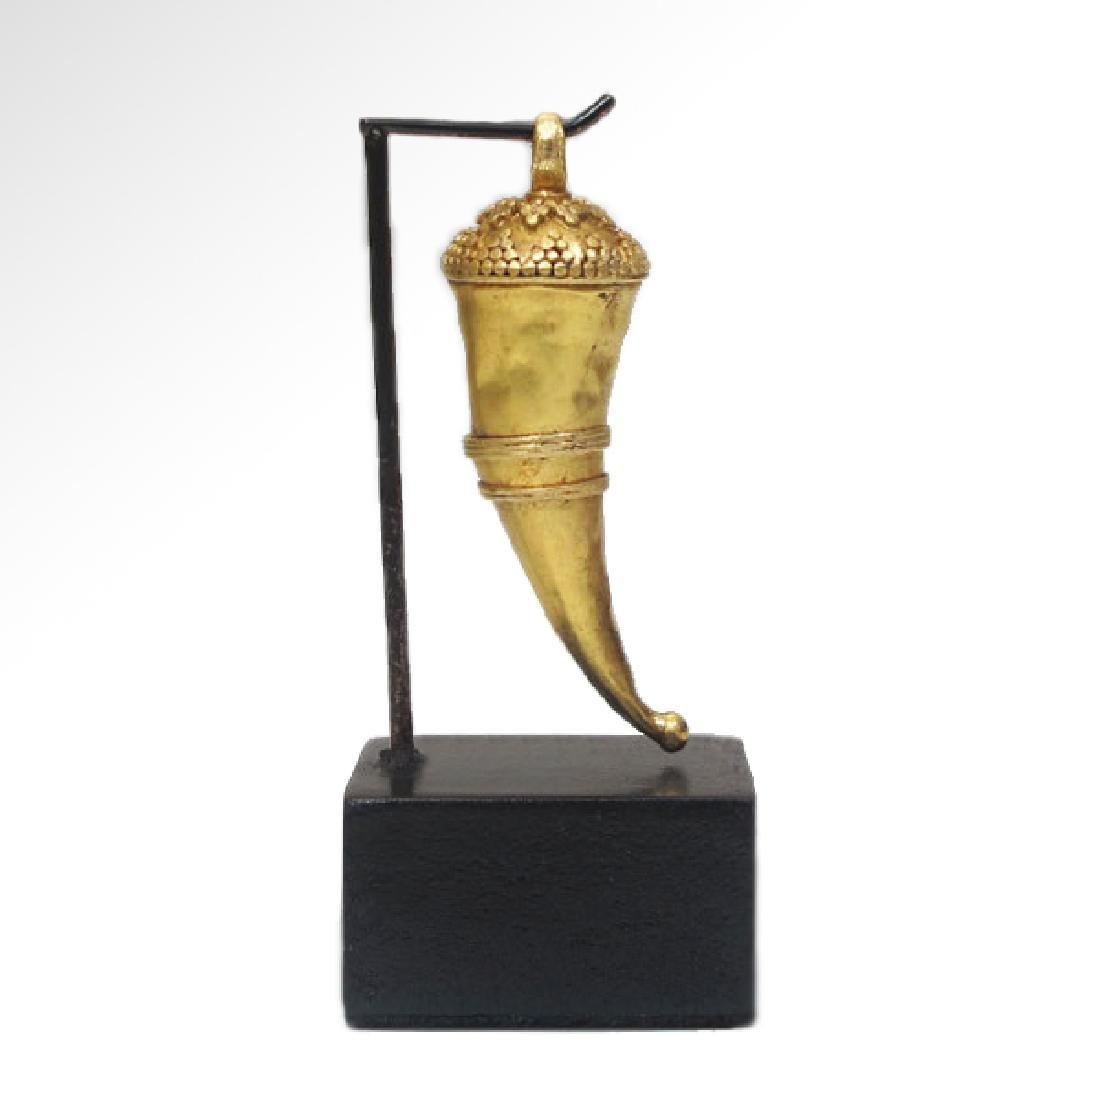 Roman Gold Pendant, Cornucopia, c. 2nd Century A.D.